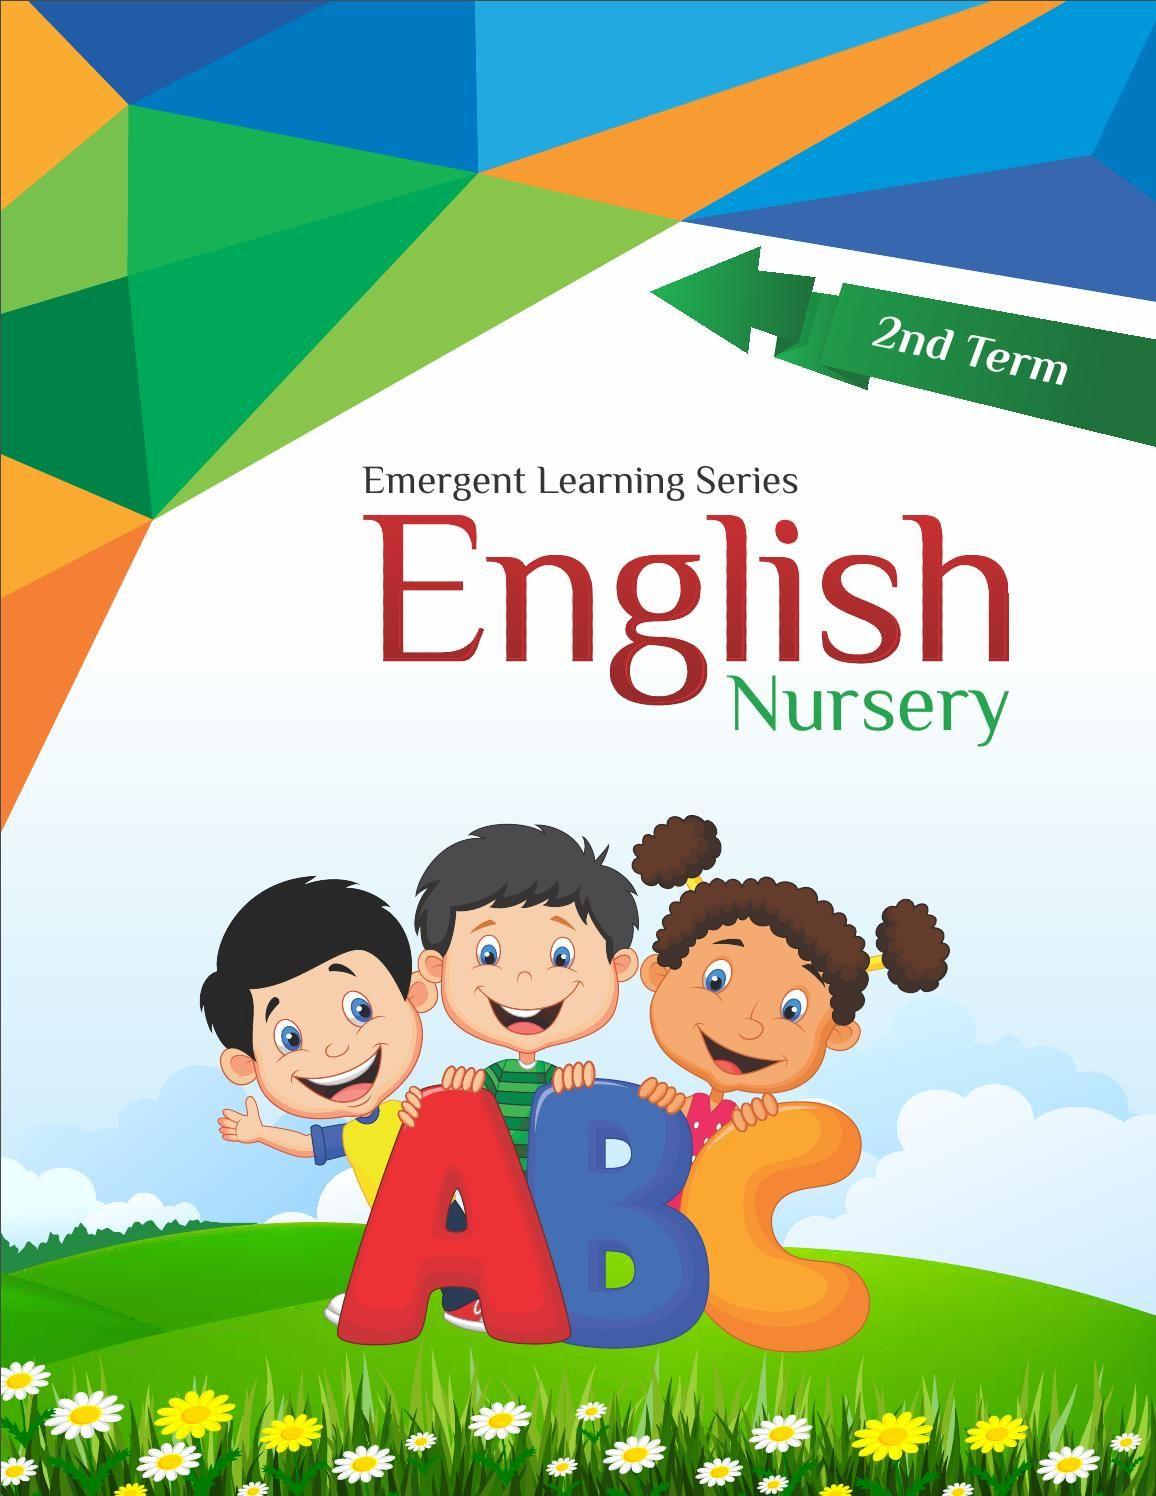 Nursery English 2nd Term Pdf English Books For Kids English Learning Books English Grammar Book Pdf